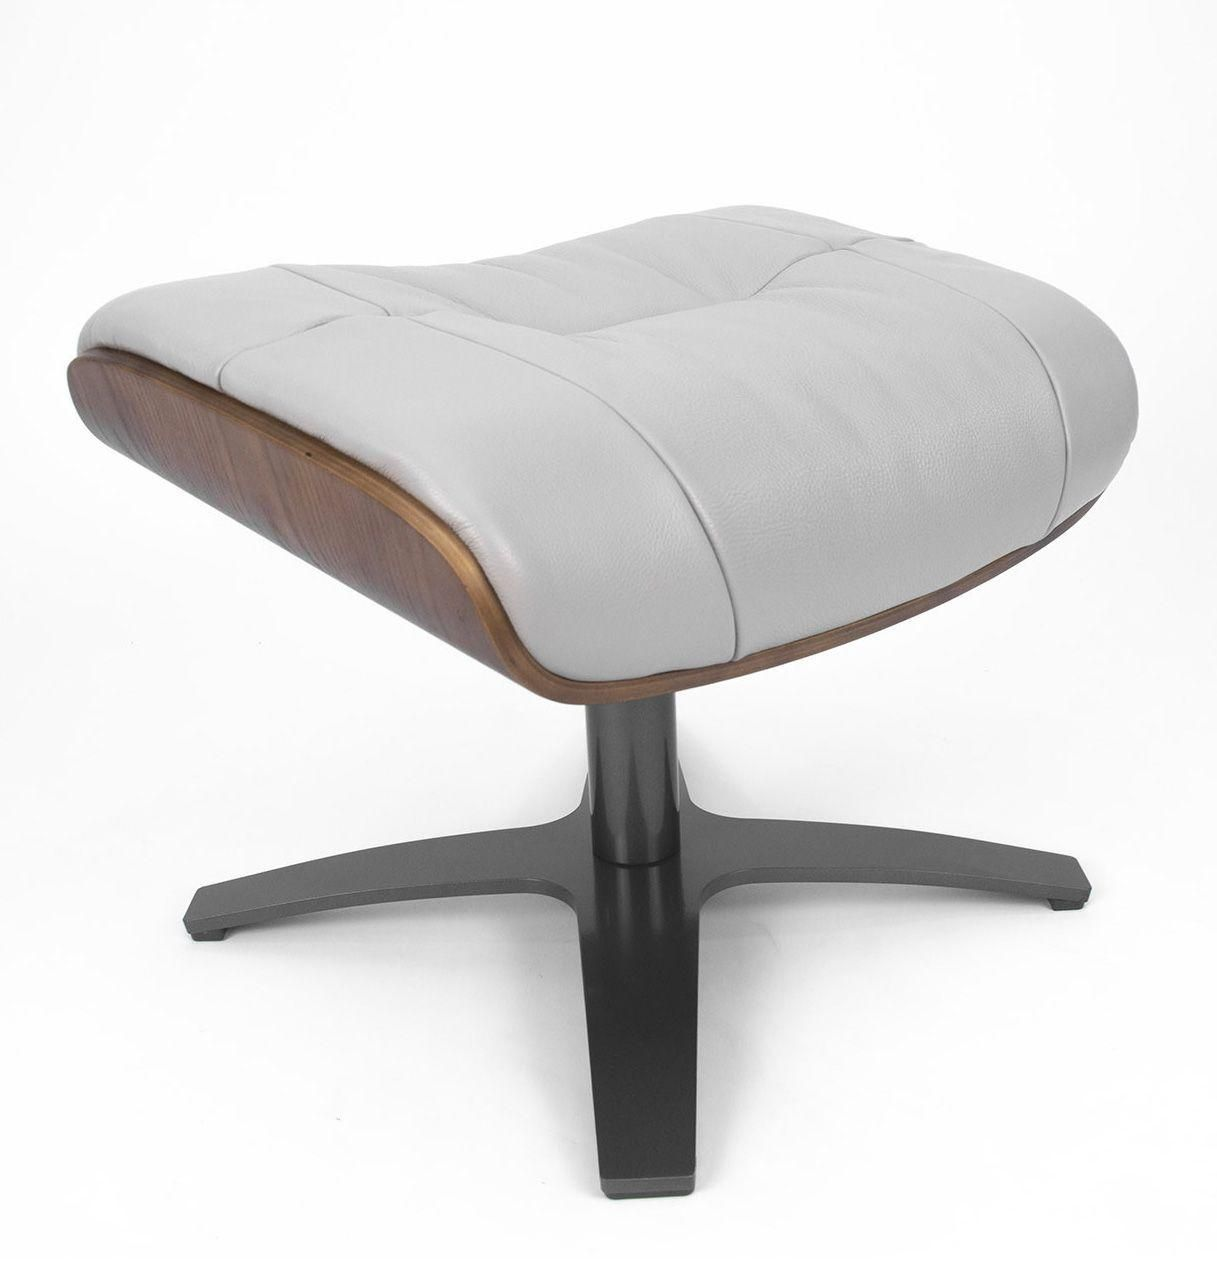 Repose-pieds de relaxation cuir gris et chêne naturel